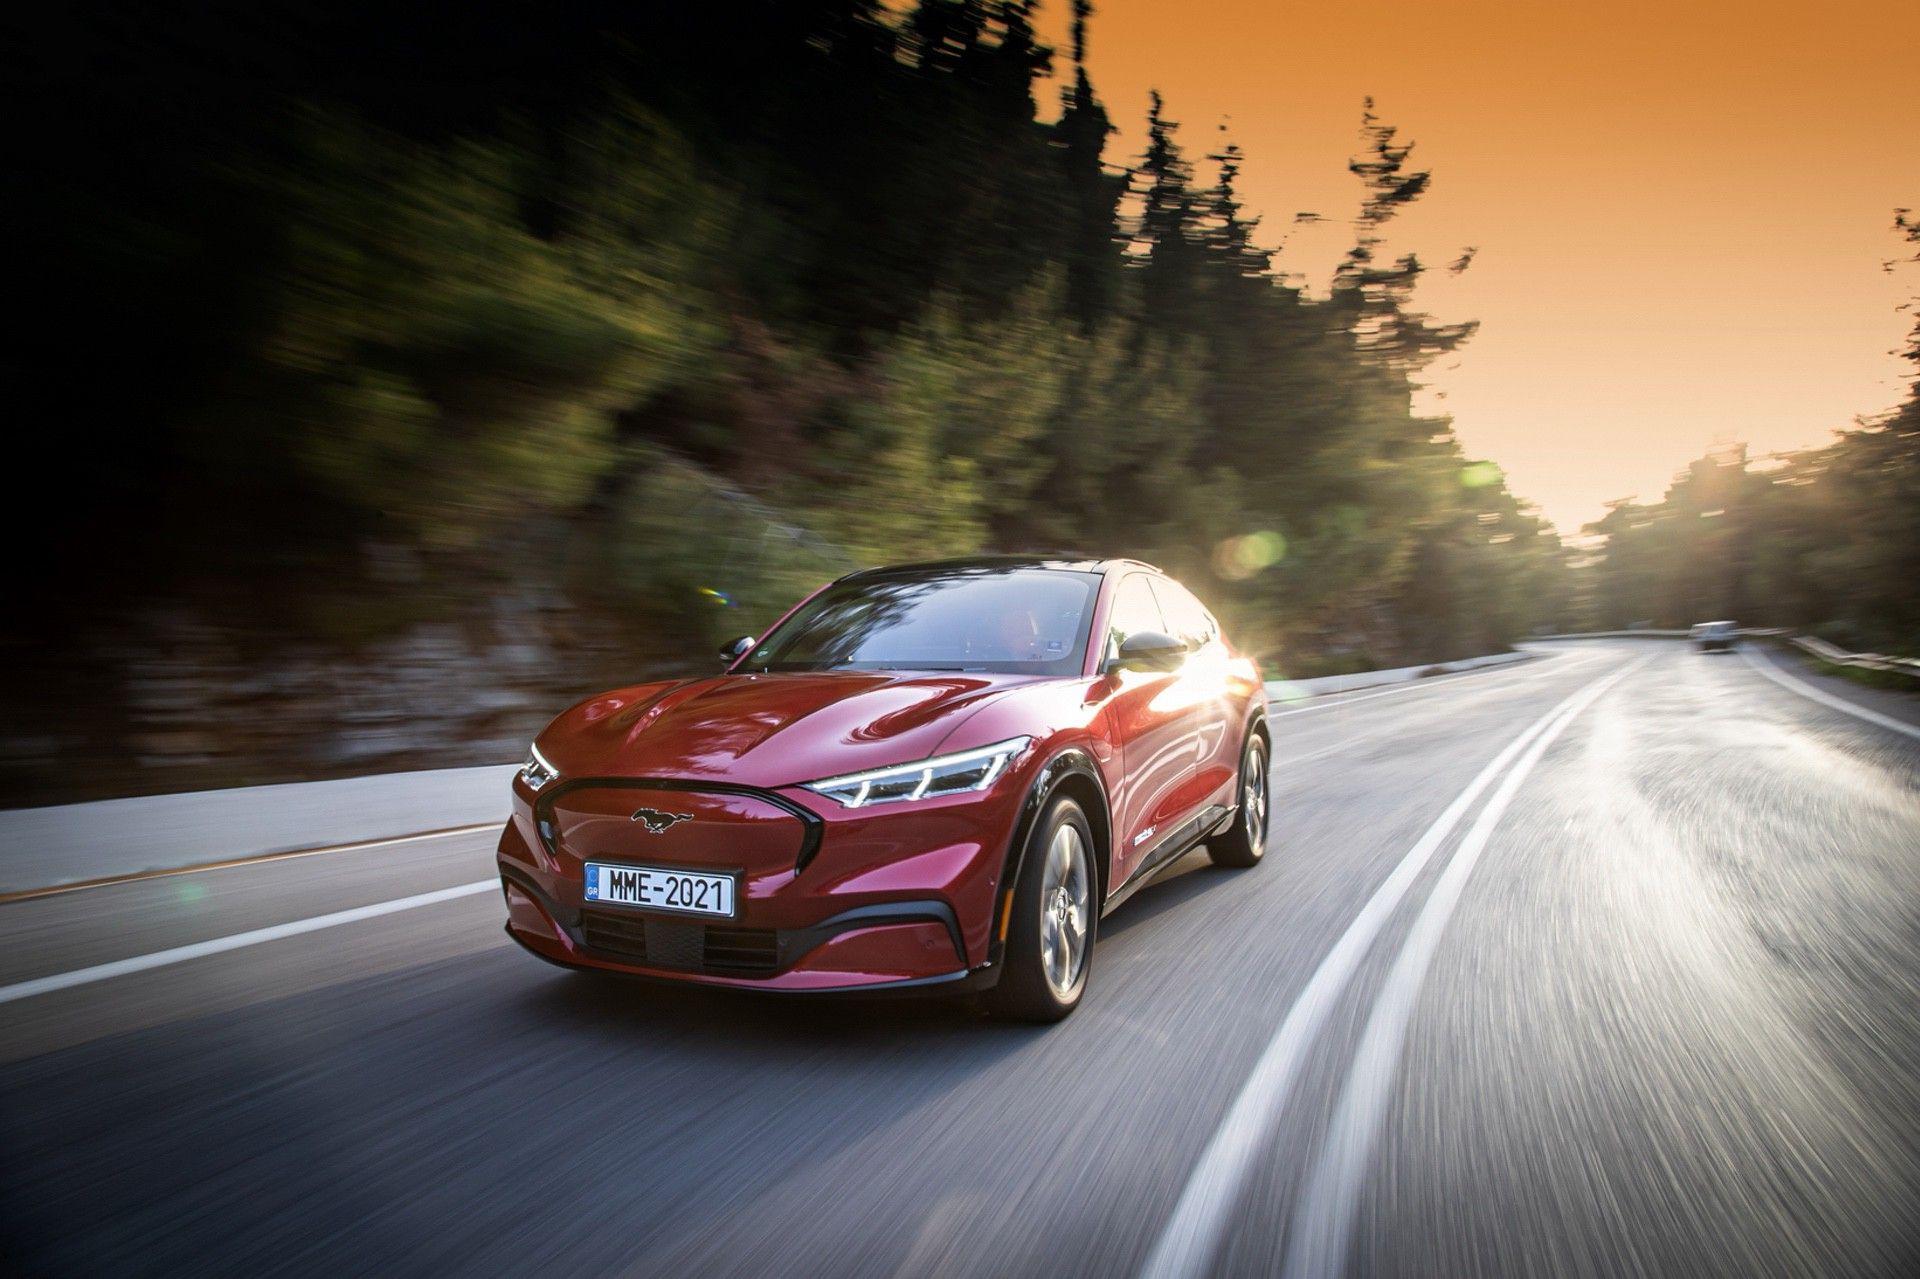 Ford_Mustang_Mach-E_greek_presskit-0073